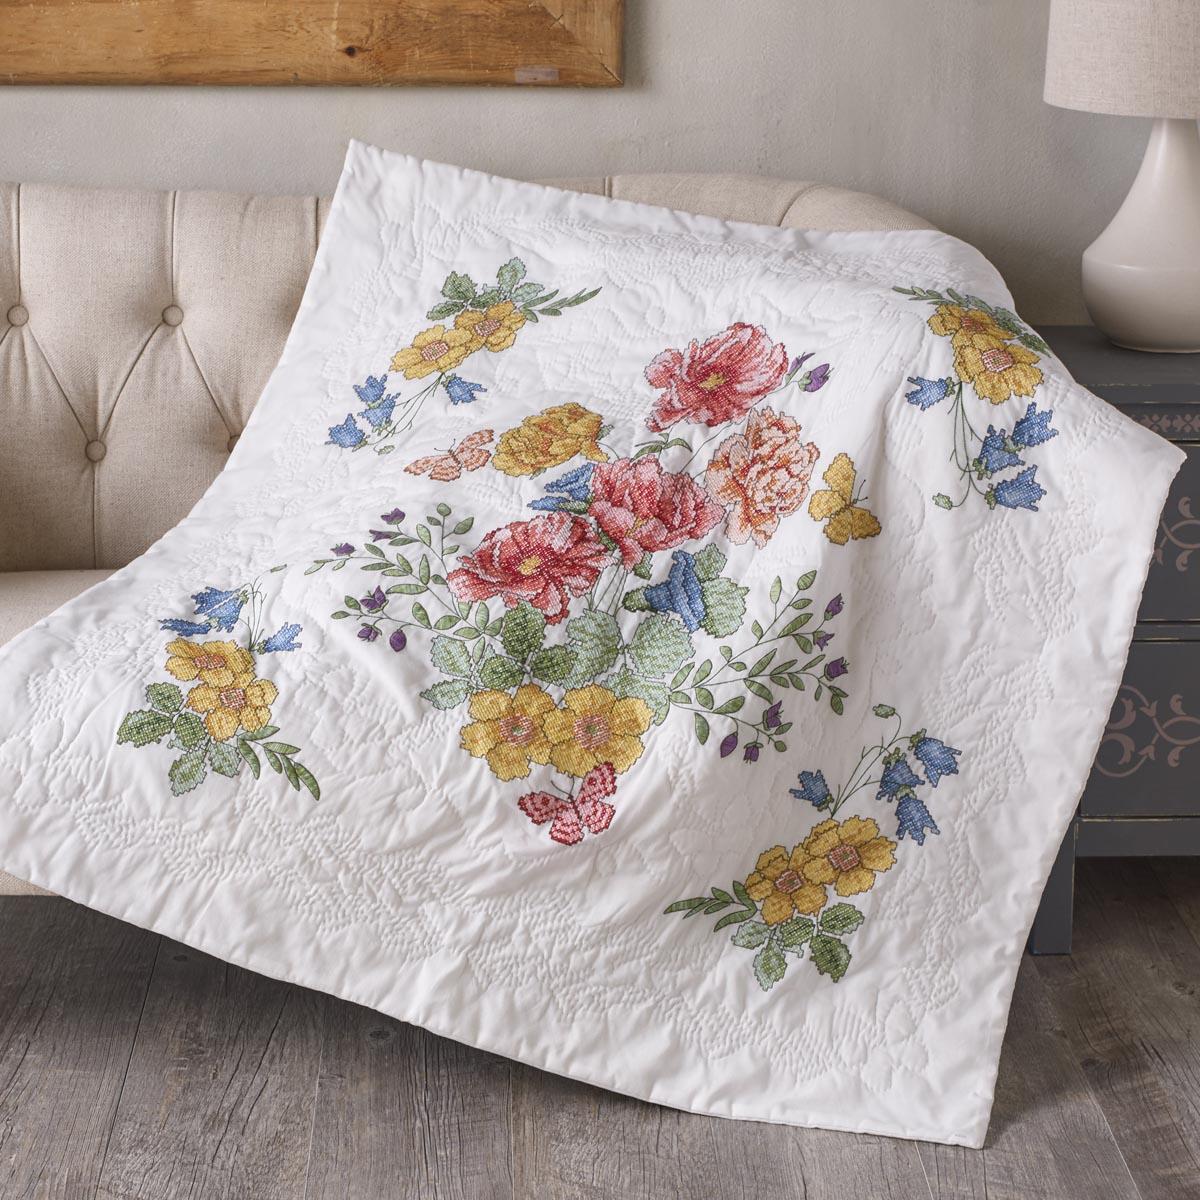 Shop Plaid Bucilla ® Stamped Cross Stitch - Lap Quilts - Flowers ... : bucilla cross stitch baby quilts - Adamdwight.com